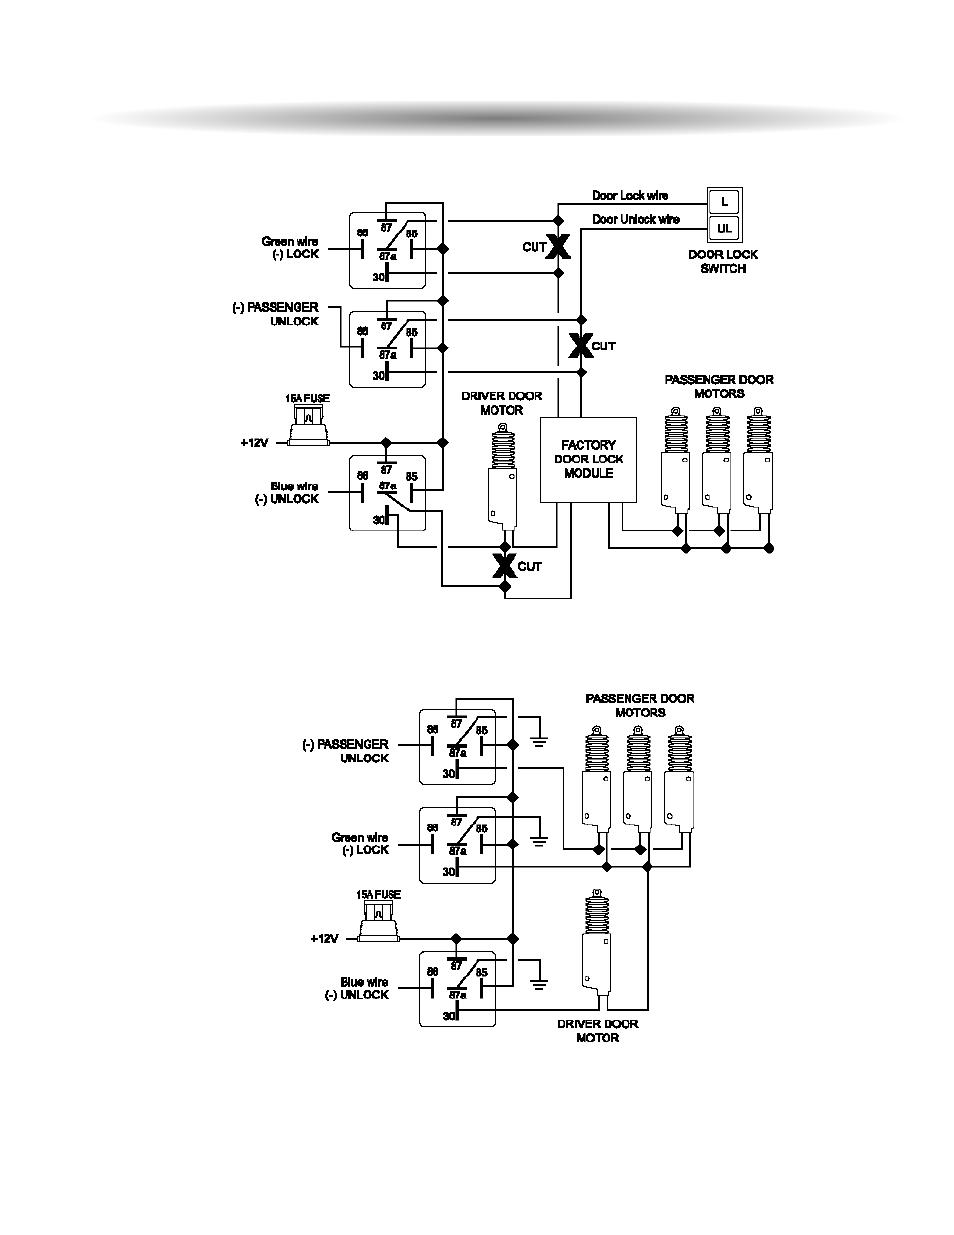 [QMVU_8575]  Scytek Car Wiring Diagram - F7 wiring diagram | Scytek Car Wiring Diagram |  | sand.mars.tattoodacosanascecosa.it